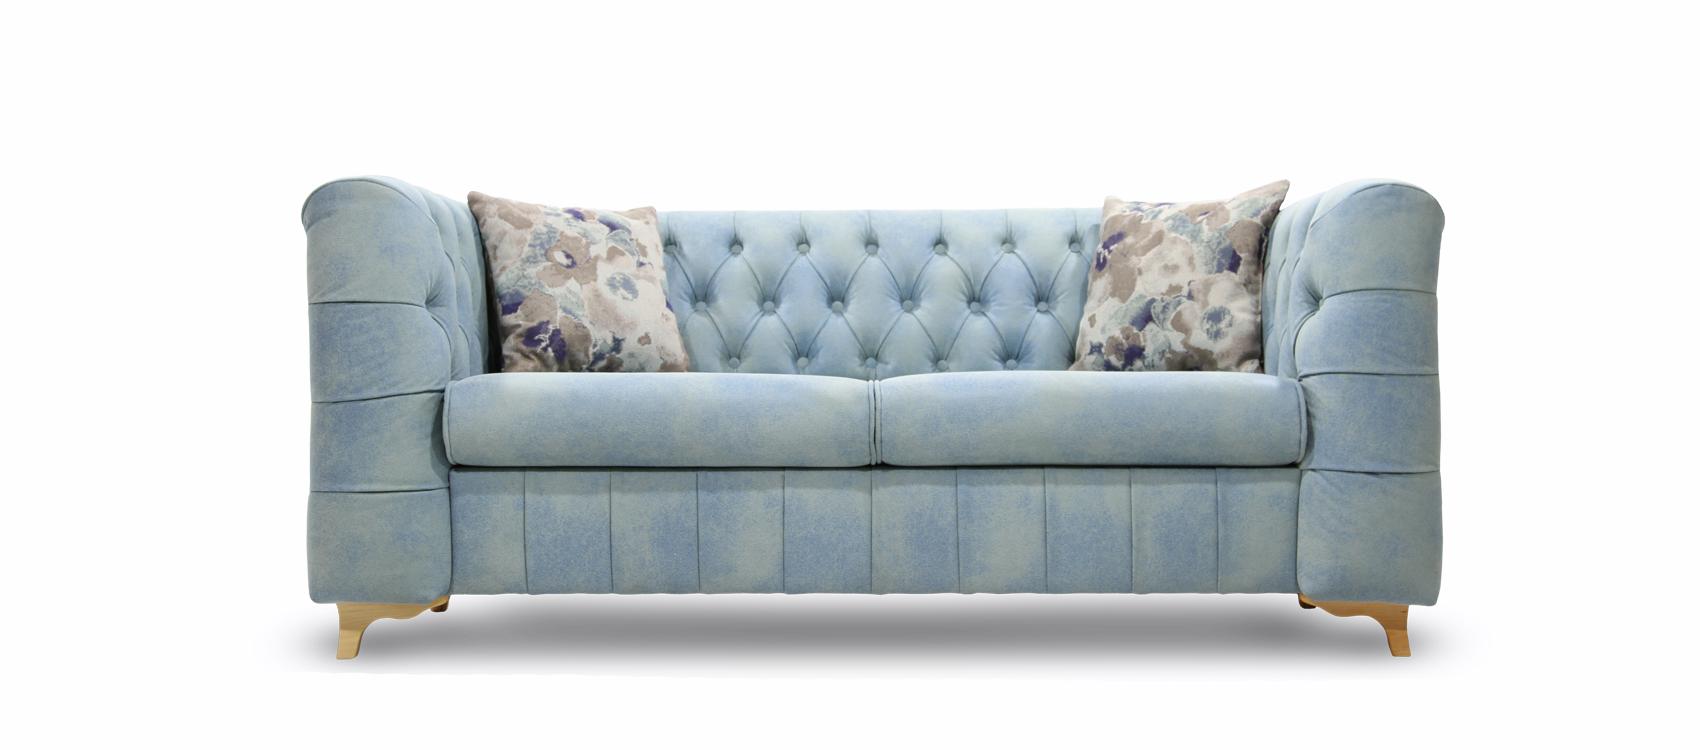 Sofa FLAIR 2 SEATER фото 1